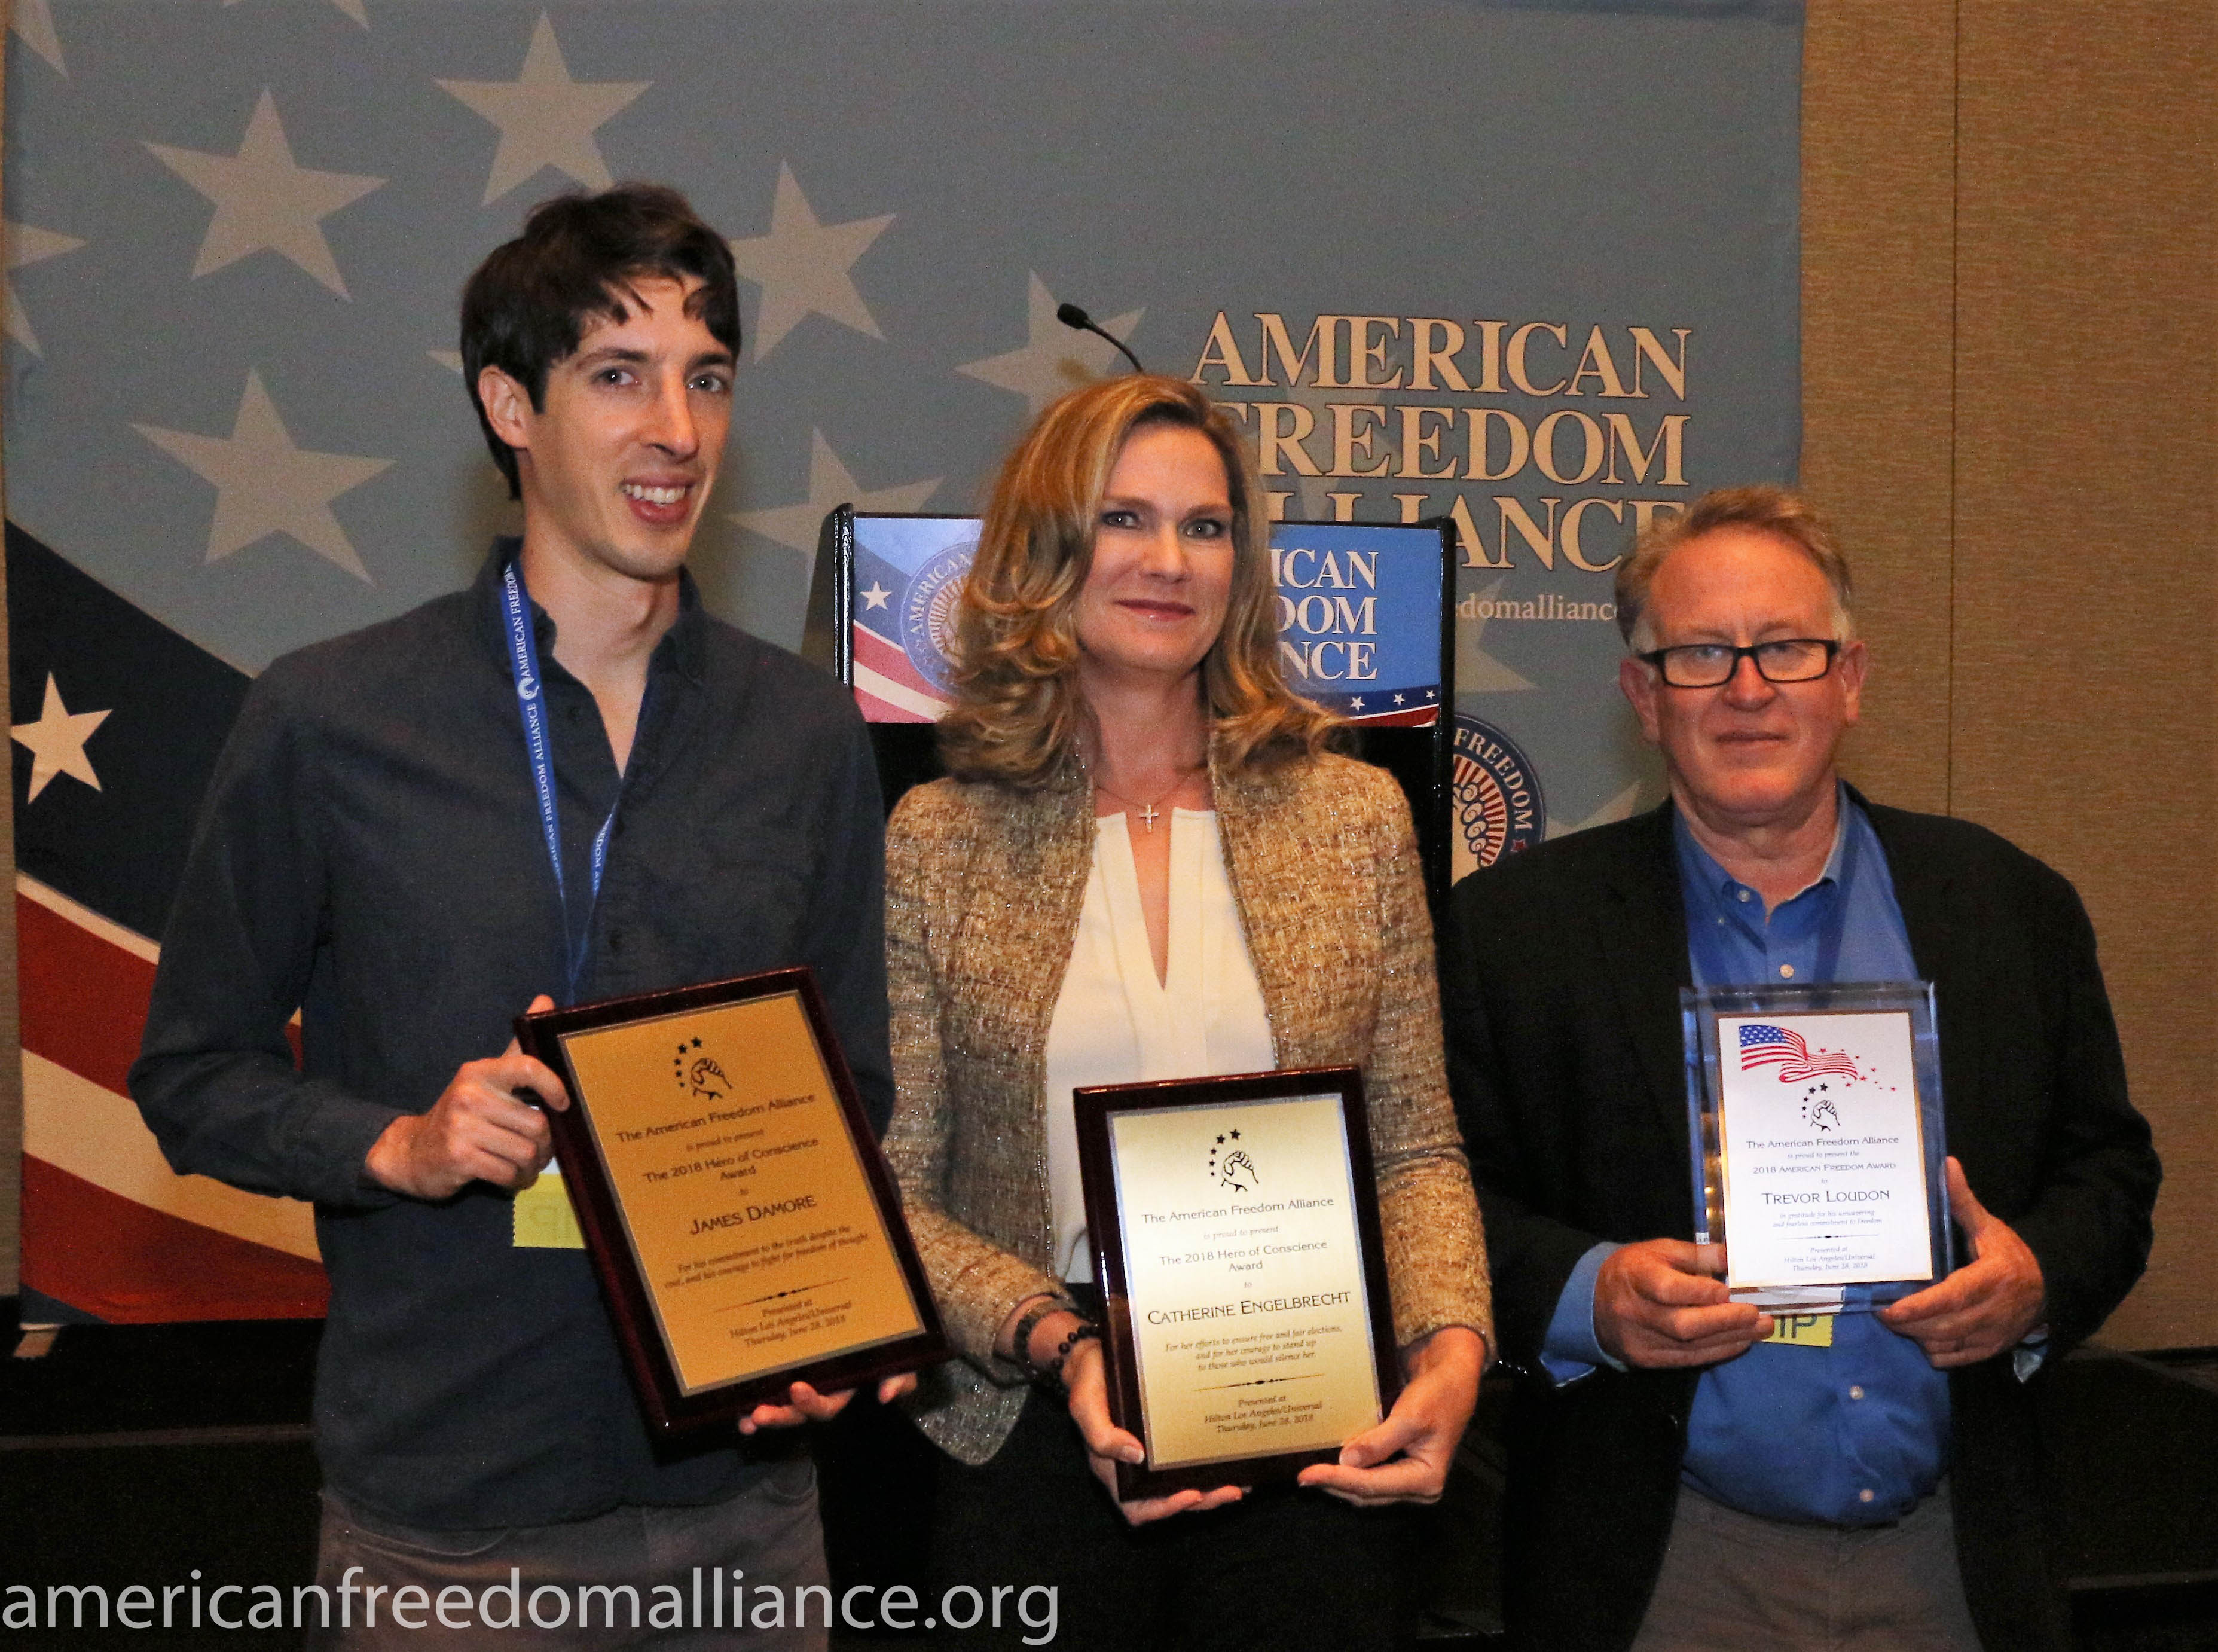 Awardees Damore, Engelbrecht, Loudon